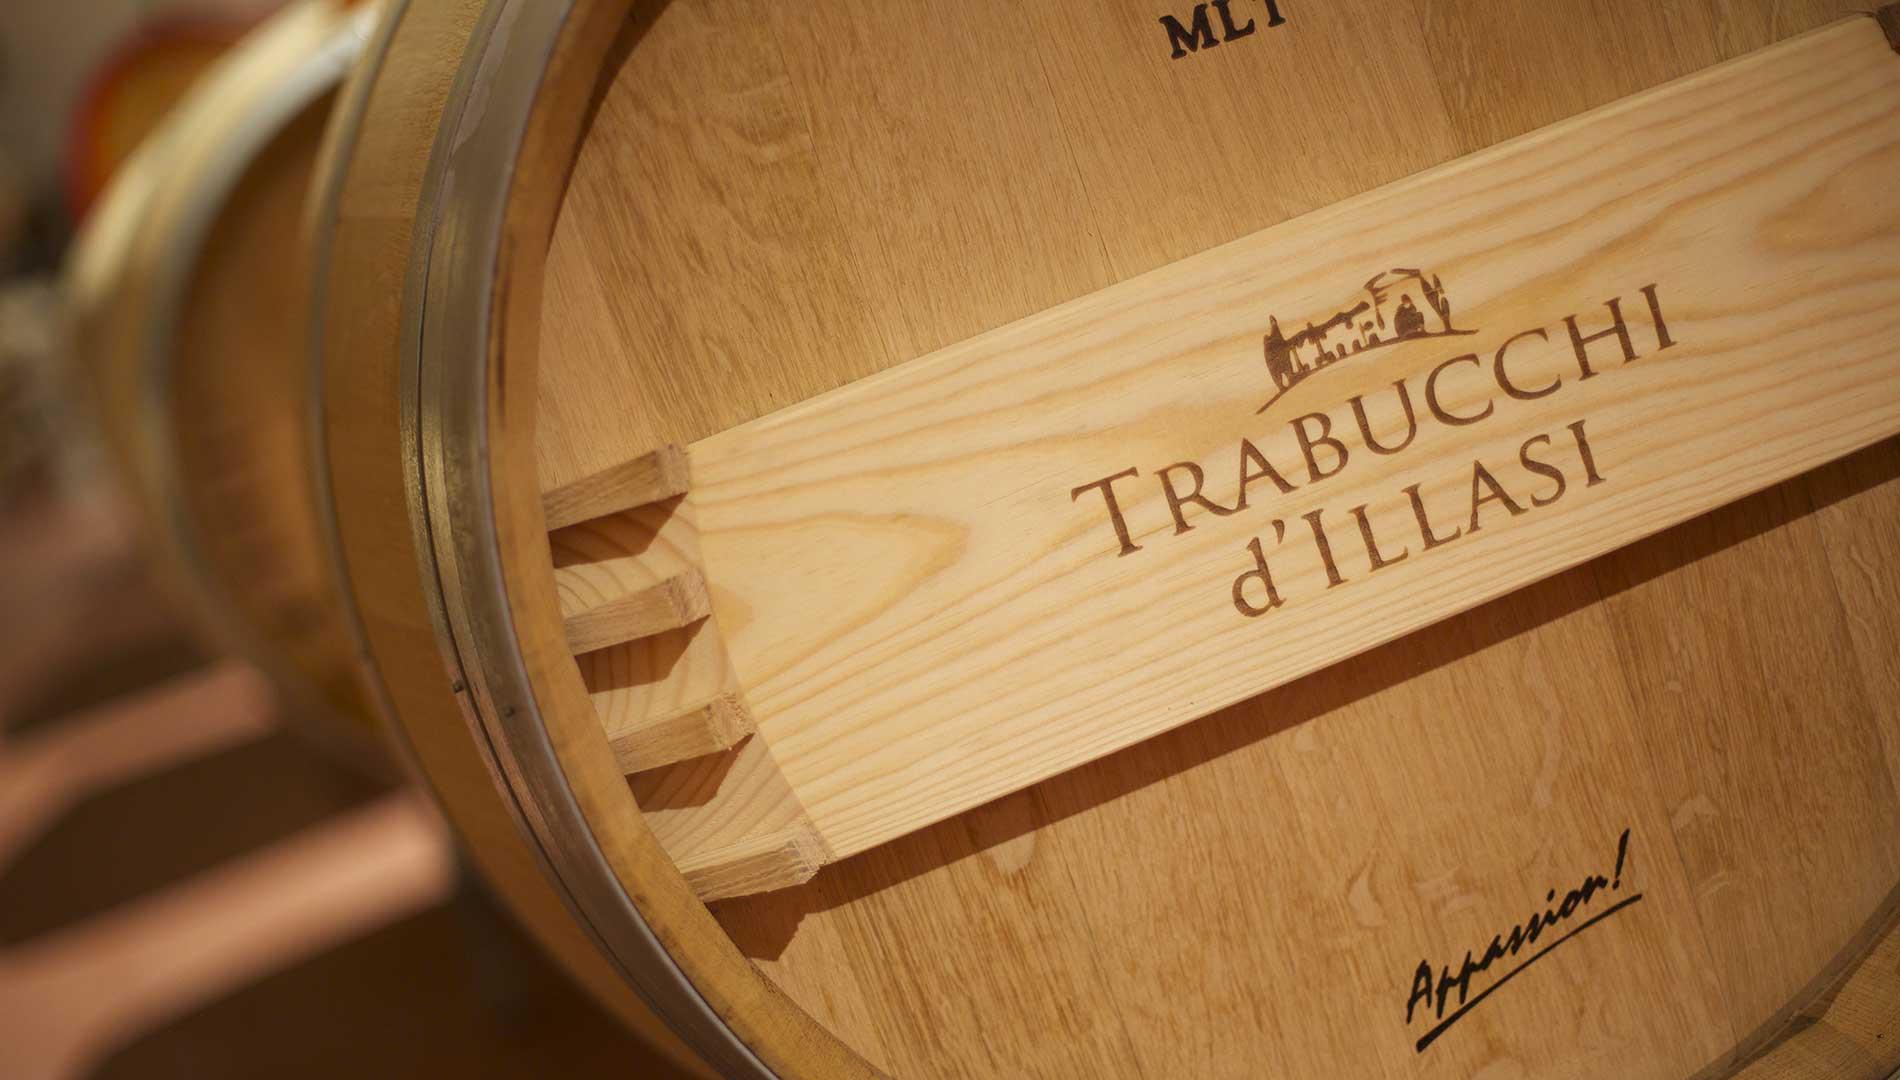 http://www.trabucchidillasi.it/wp-content/uploads/2018/01/Trabucchi-Illasi-degustazione-visita.jpg